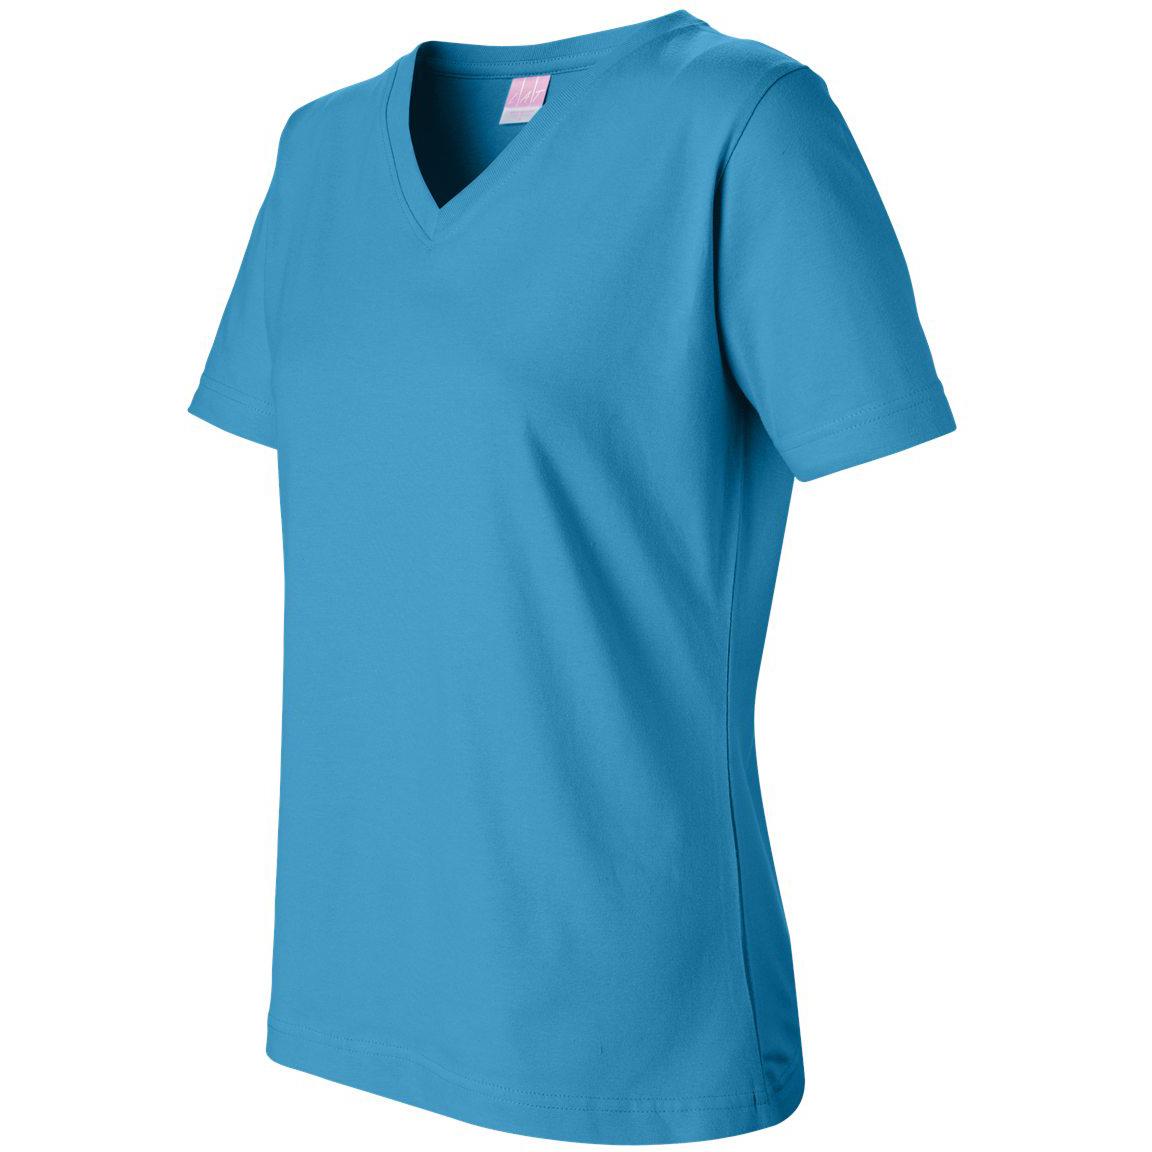 Lat 3587 women 39 s short sleeve v neck t shirt turquoise for Aqua blue color t shirt